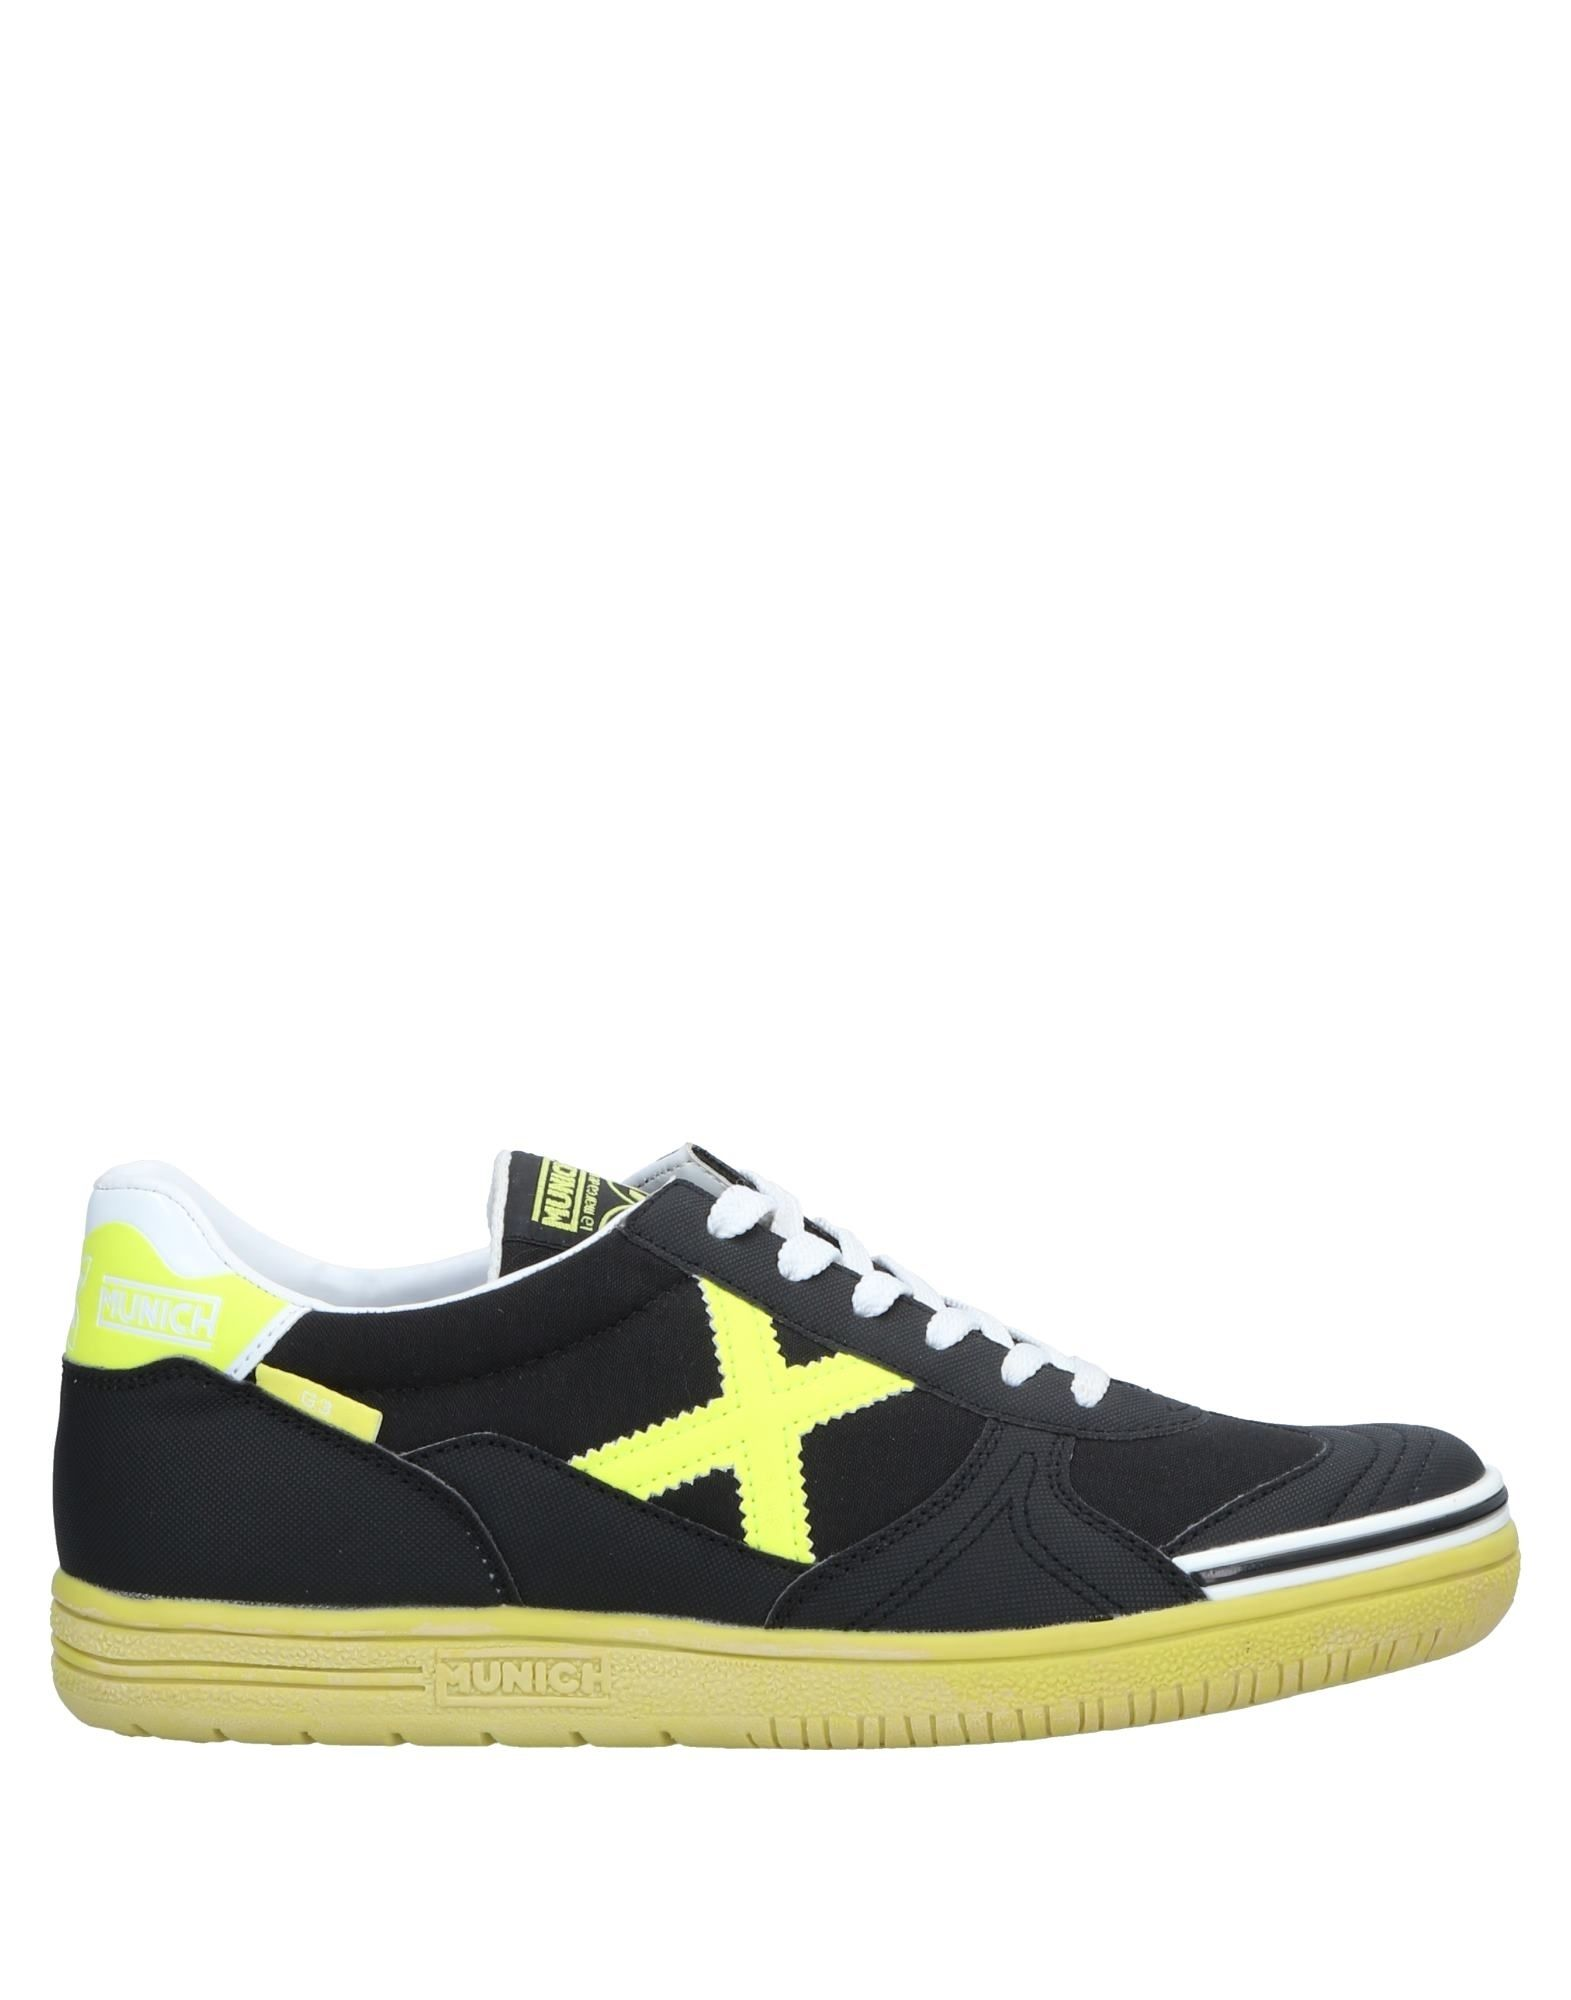 Rabatt echte Schuhe Munich  Sneakers Herren  Munich 11541721AW f8ad7f